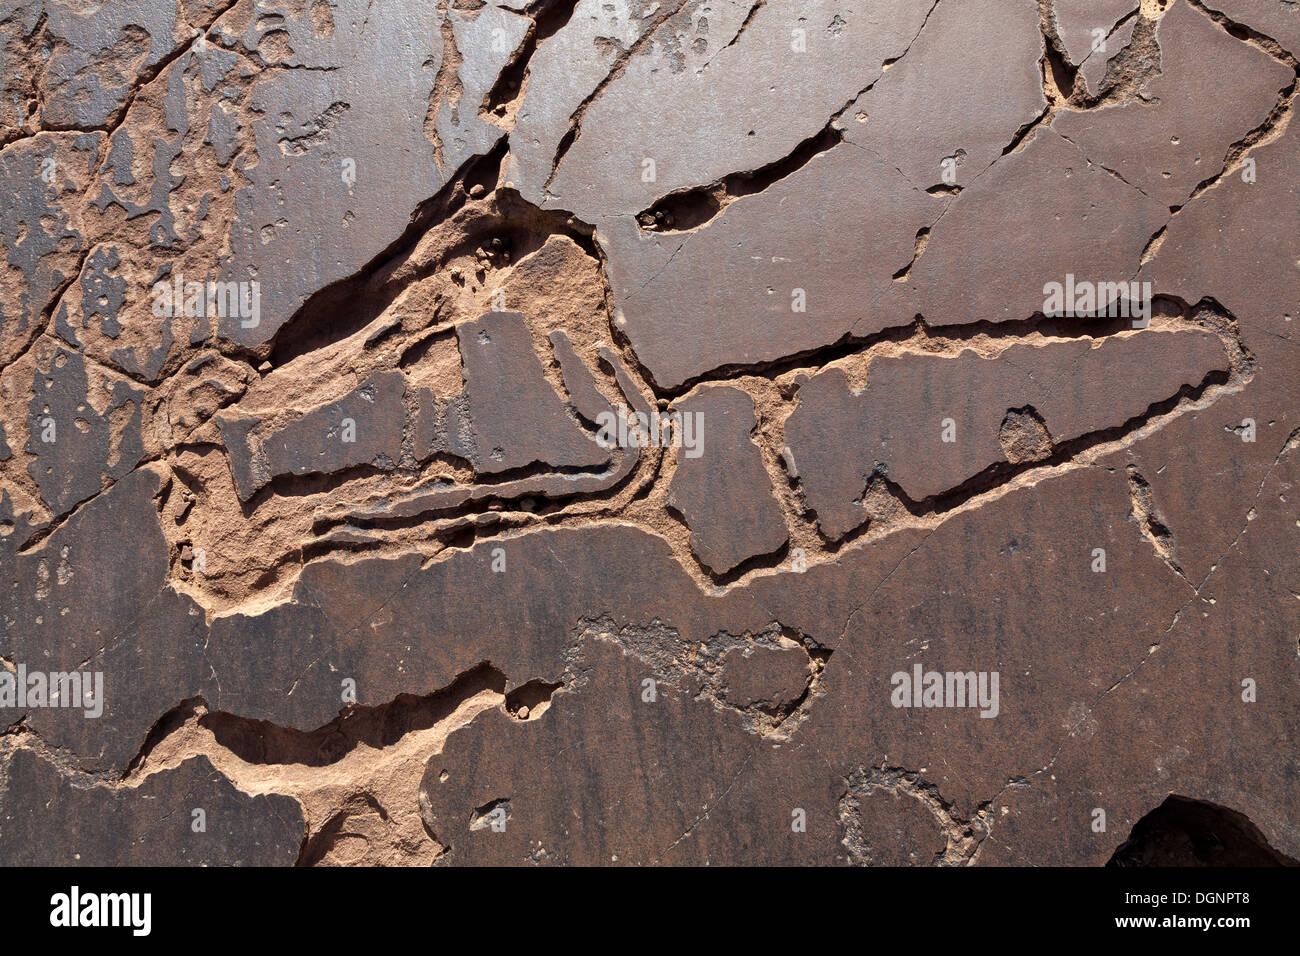 Prehistoric rock carvings at Oukaimeden Ski Resort in the High Atlas Mountains Morocco - Stock Image